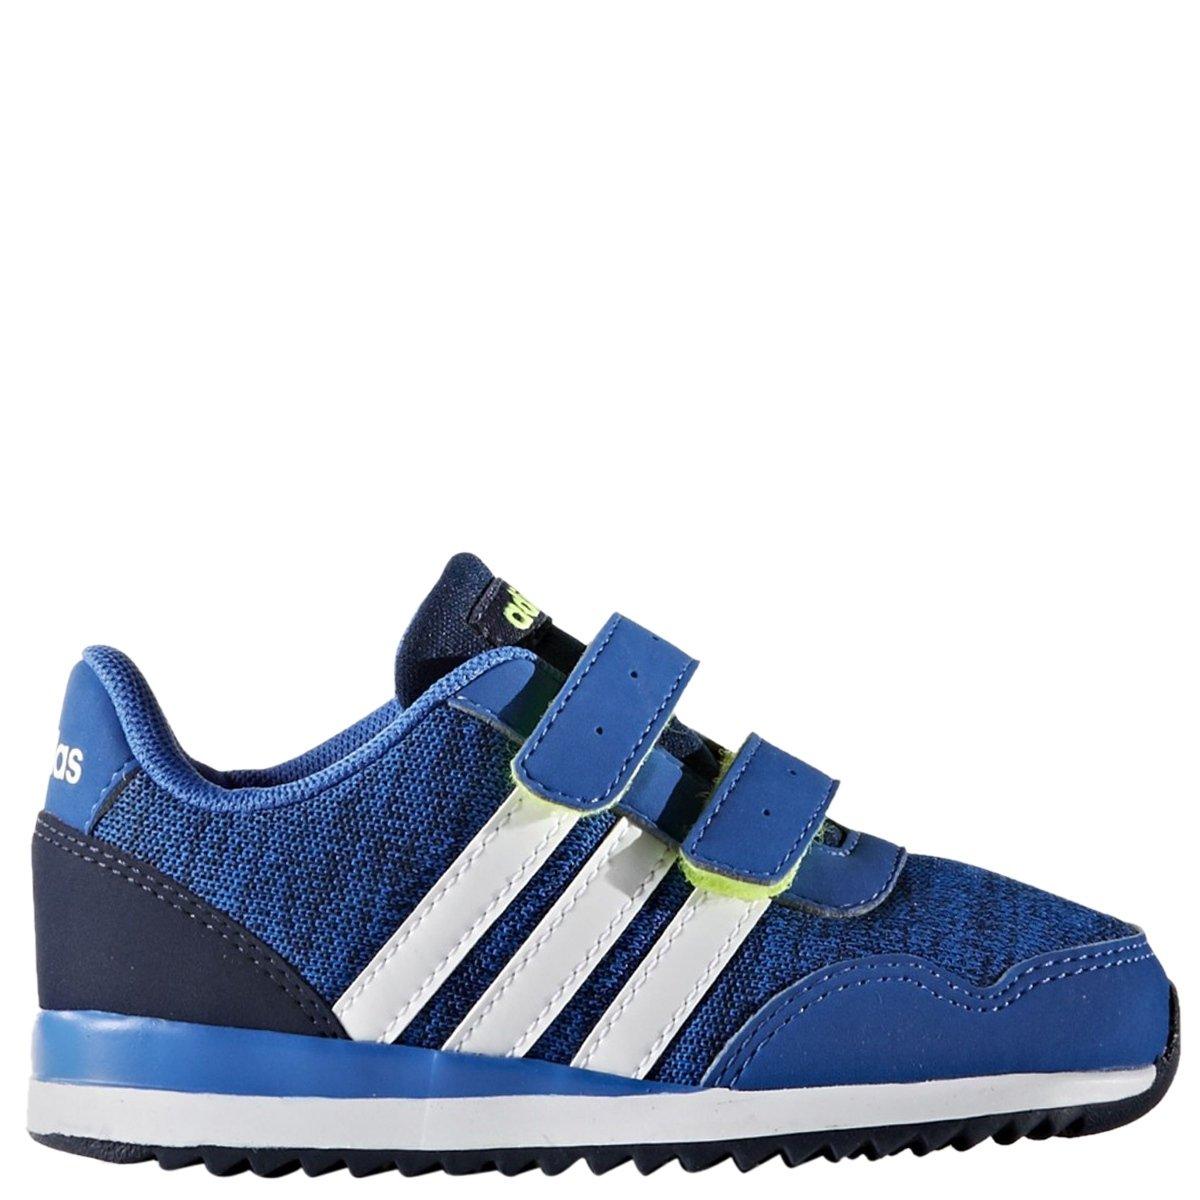 baa5bbf4f4 Bizz Store - Tênis Infantil Menino Adidas V Jog CMF Azul